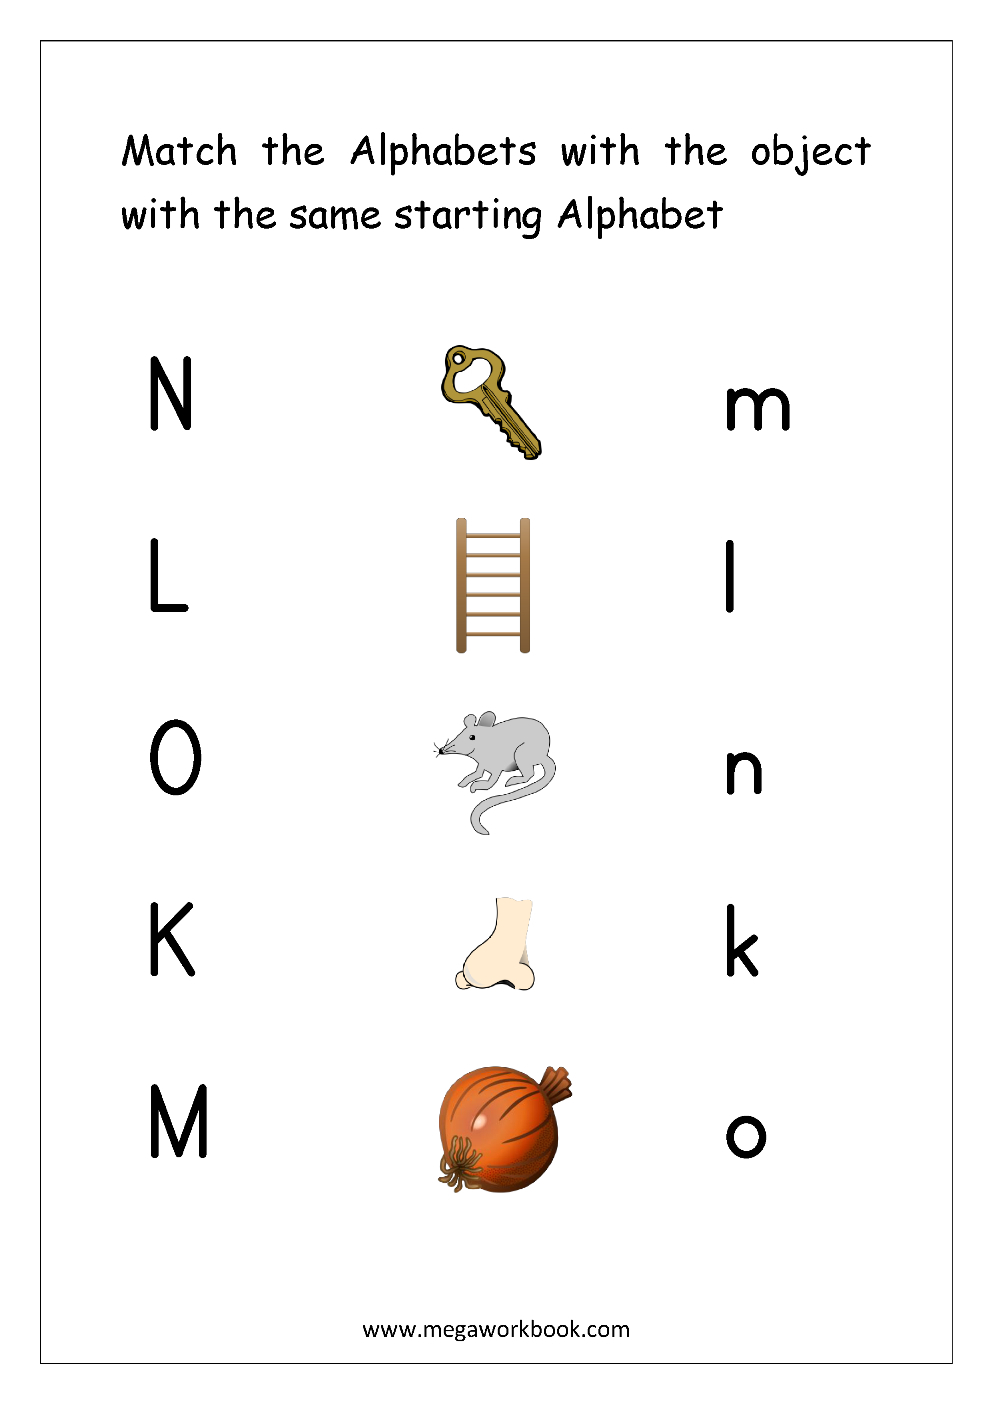 Free English Worksheets - Alphabet Matching - Megaworkbook for Alphabet Matching Worksheets With Pictures